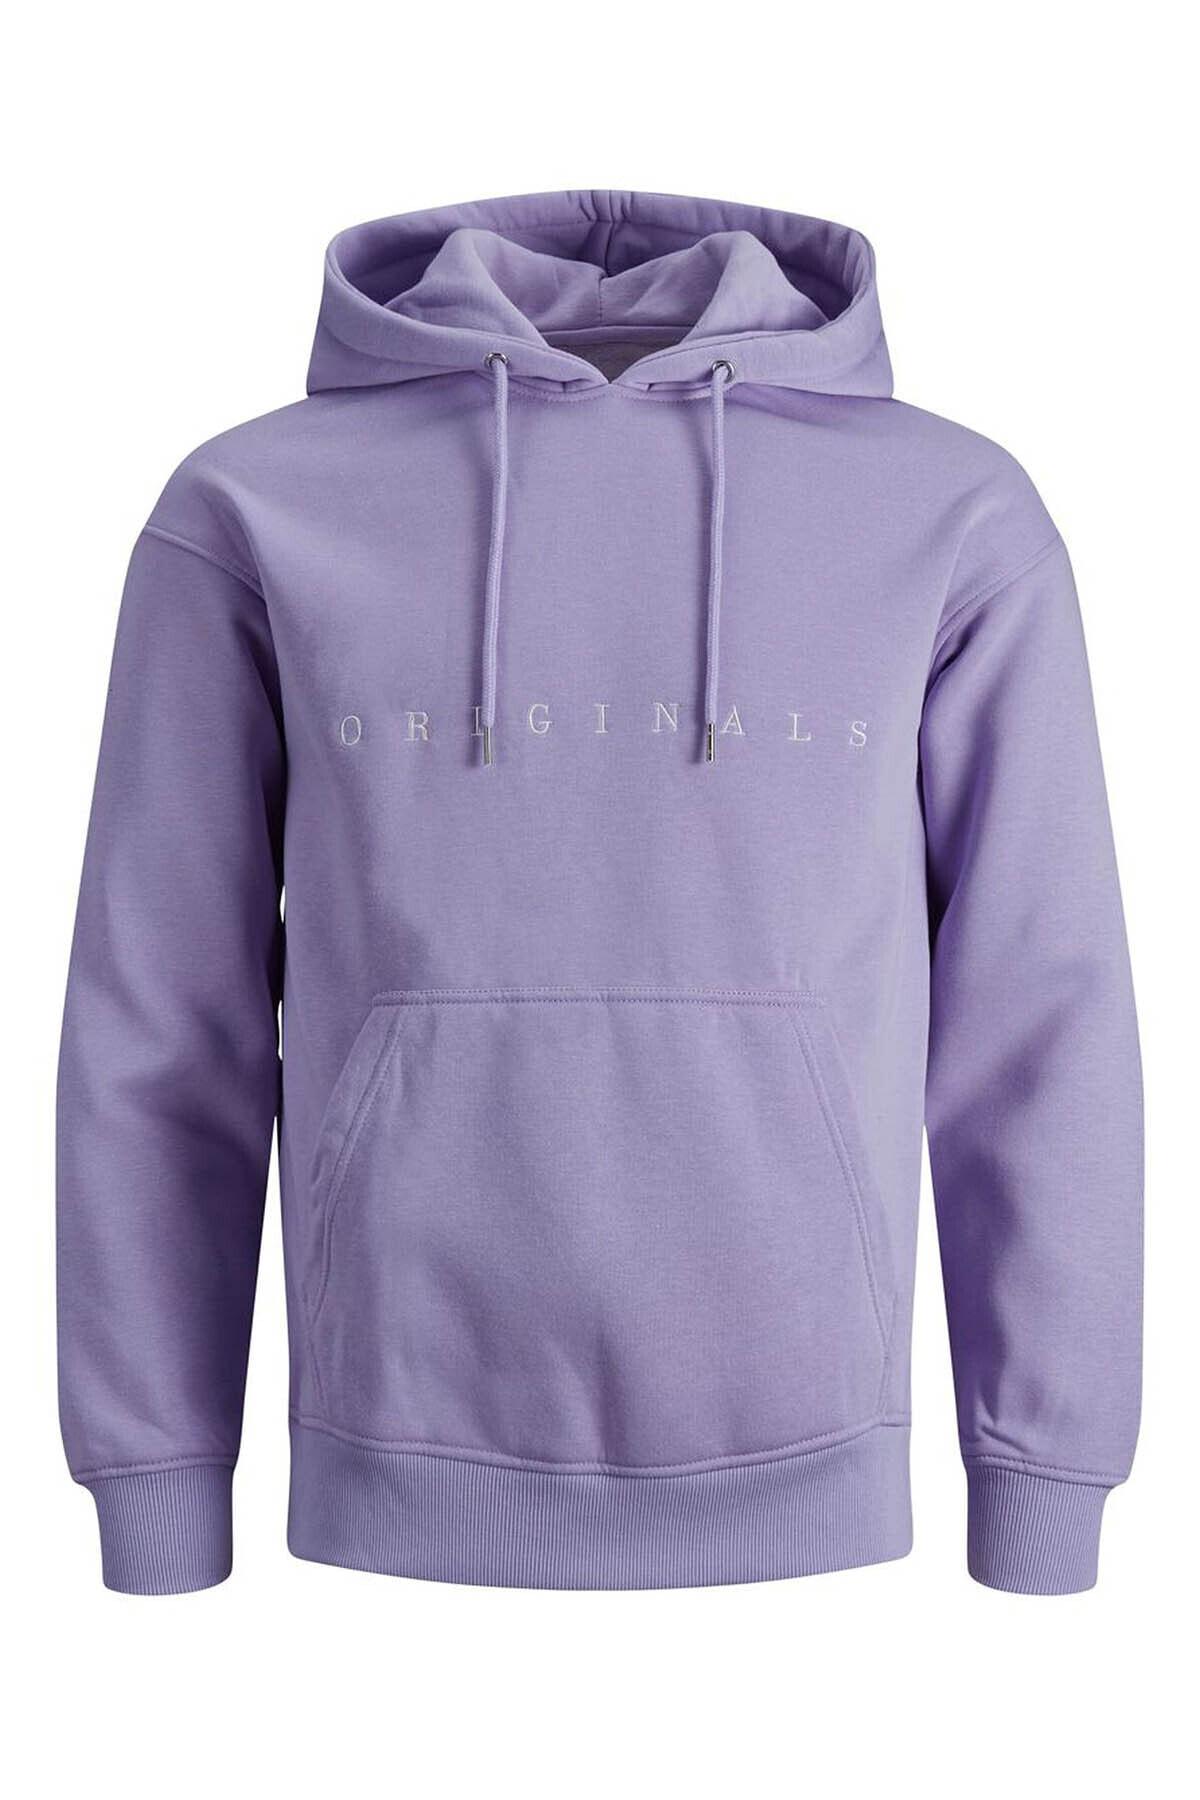 Jack & Jones Erkek Copenhagen Sweatshirt Loopback Relaxed Fıt Hoodıe - 12176864 1